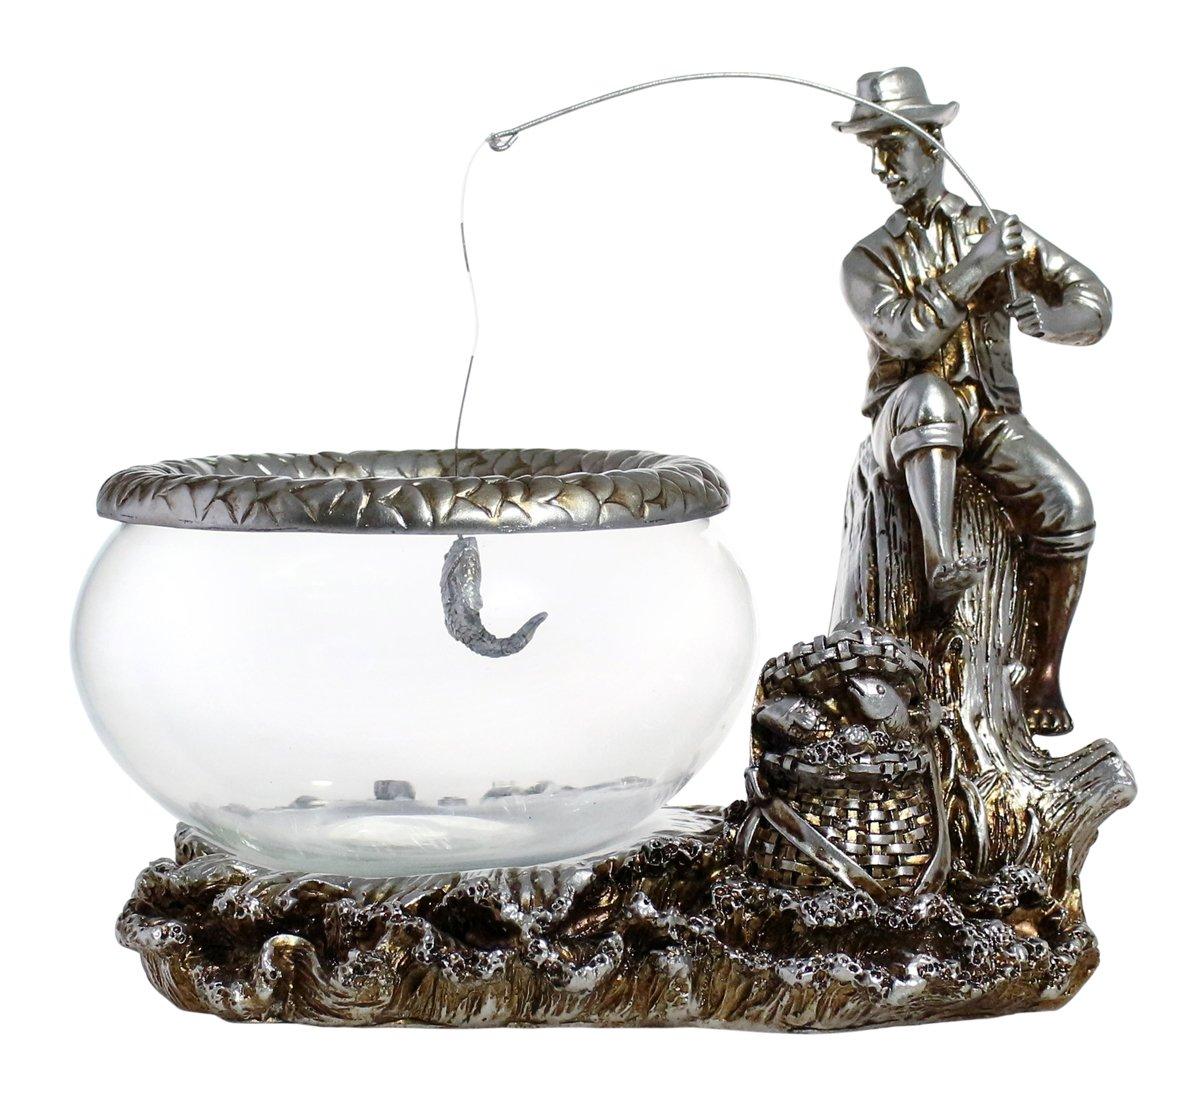 Classic Style Vintage Glass Fish Bowl Tank - Country Fellow Fishing on a Tree Trunk | 0.26 Gallon | Fishbowl Measured 6.1''x6.1''x3.1'' | Goldfish | Betta Fish | Guppies | Aquatic Plants | Chlorella